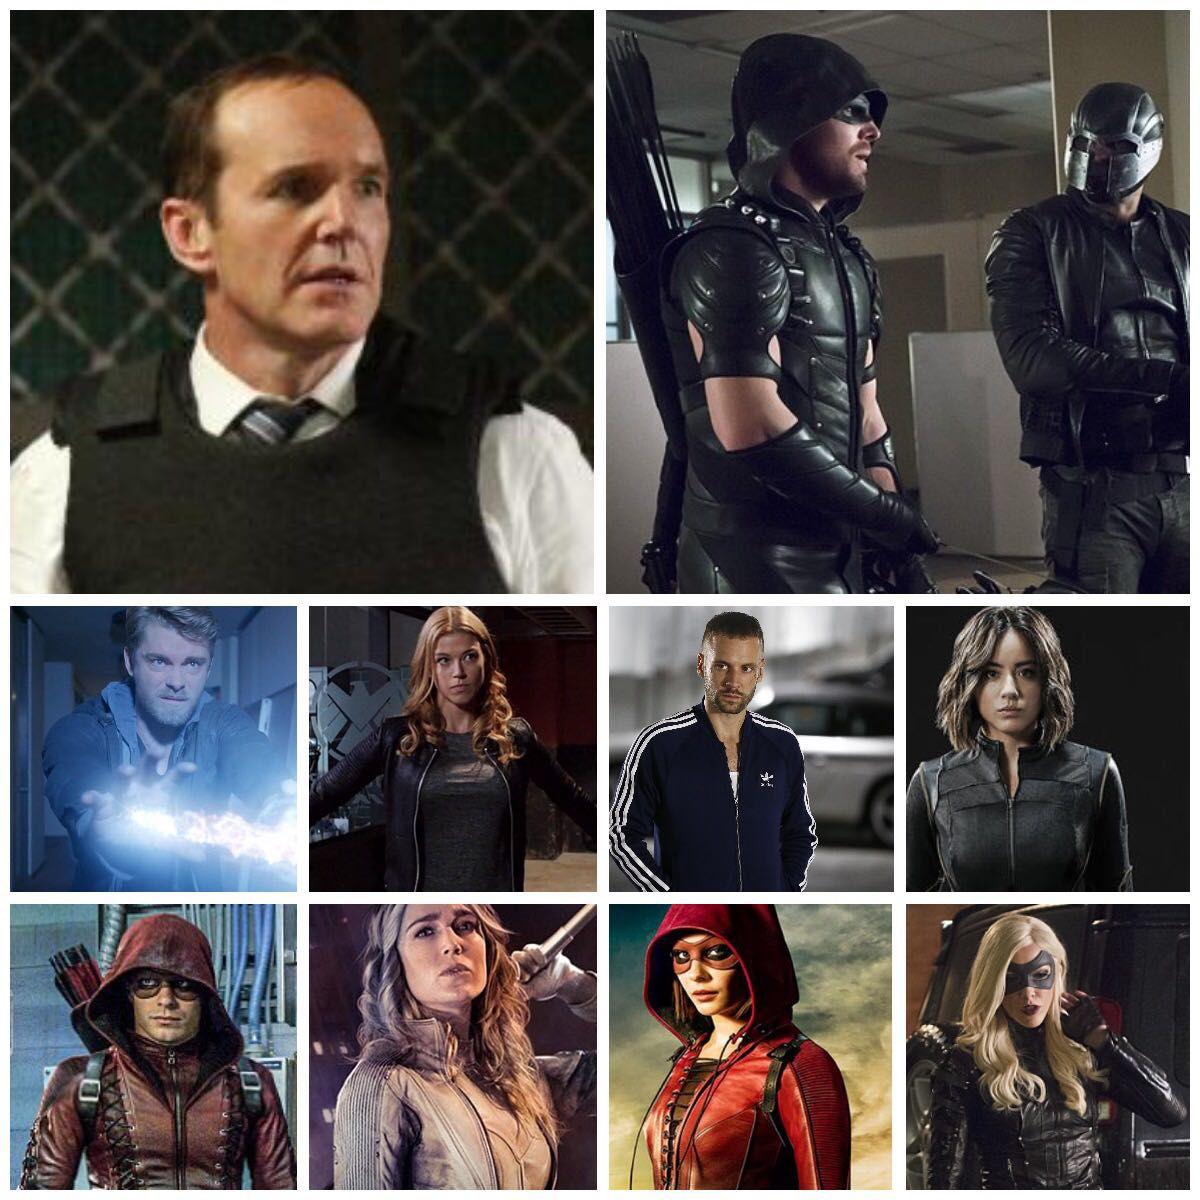 Agent Felicity Smoak - Chapter 7 : The Agents vs The Vigilantes